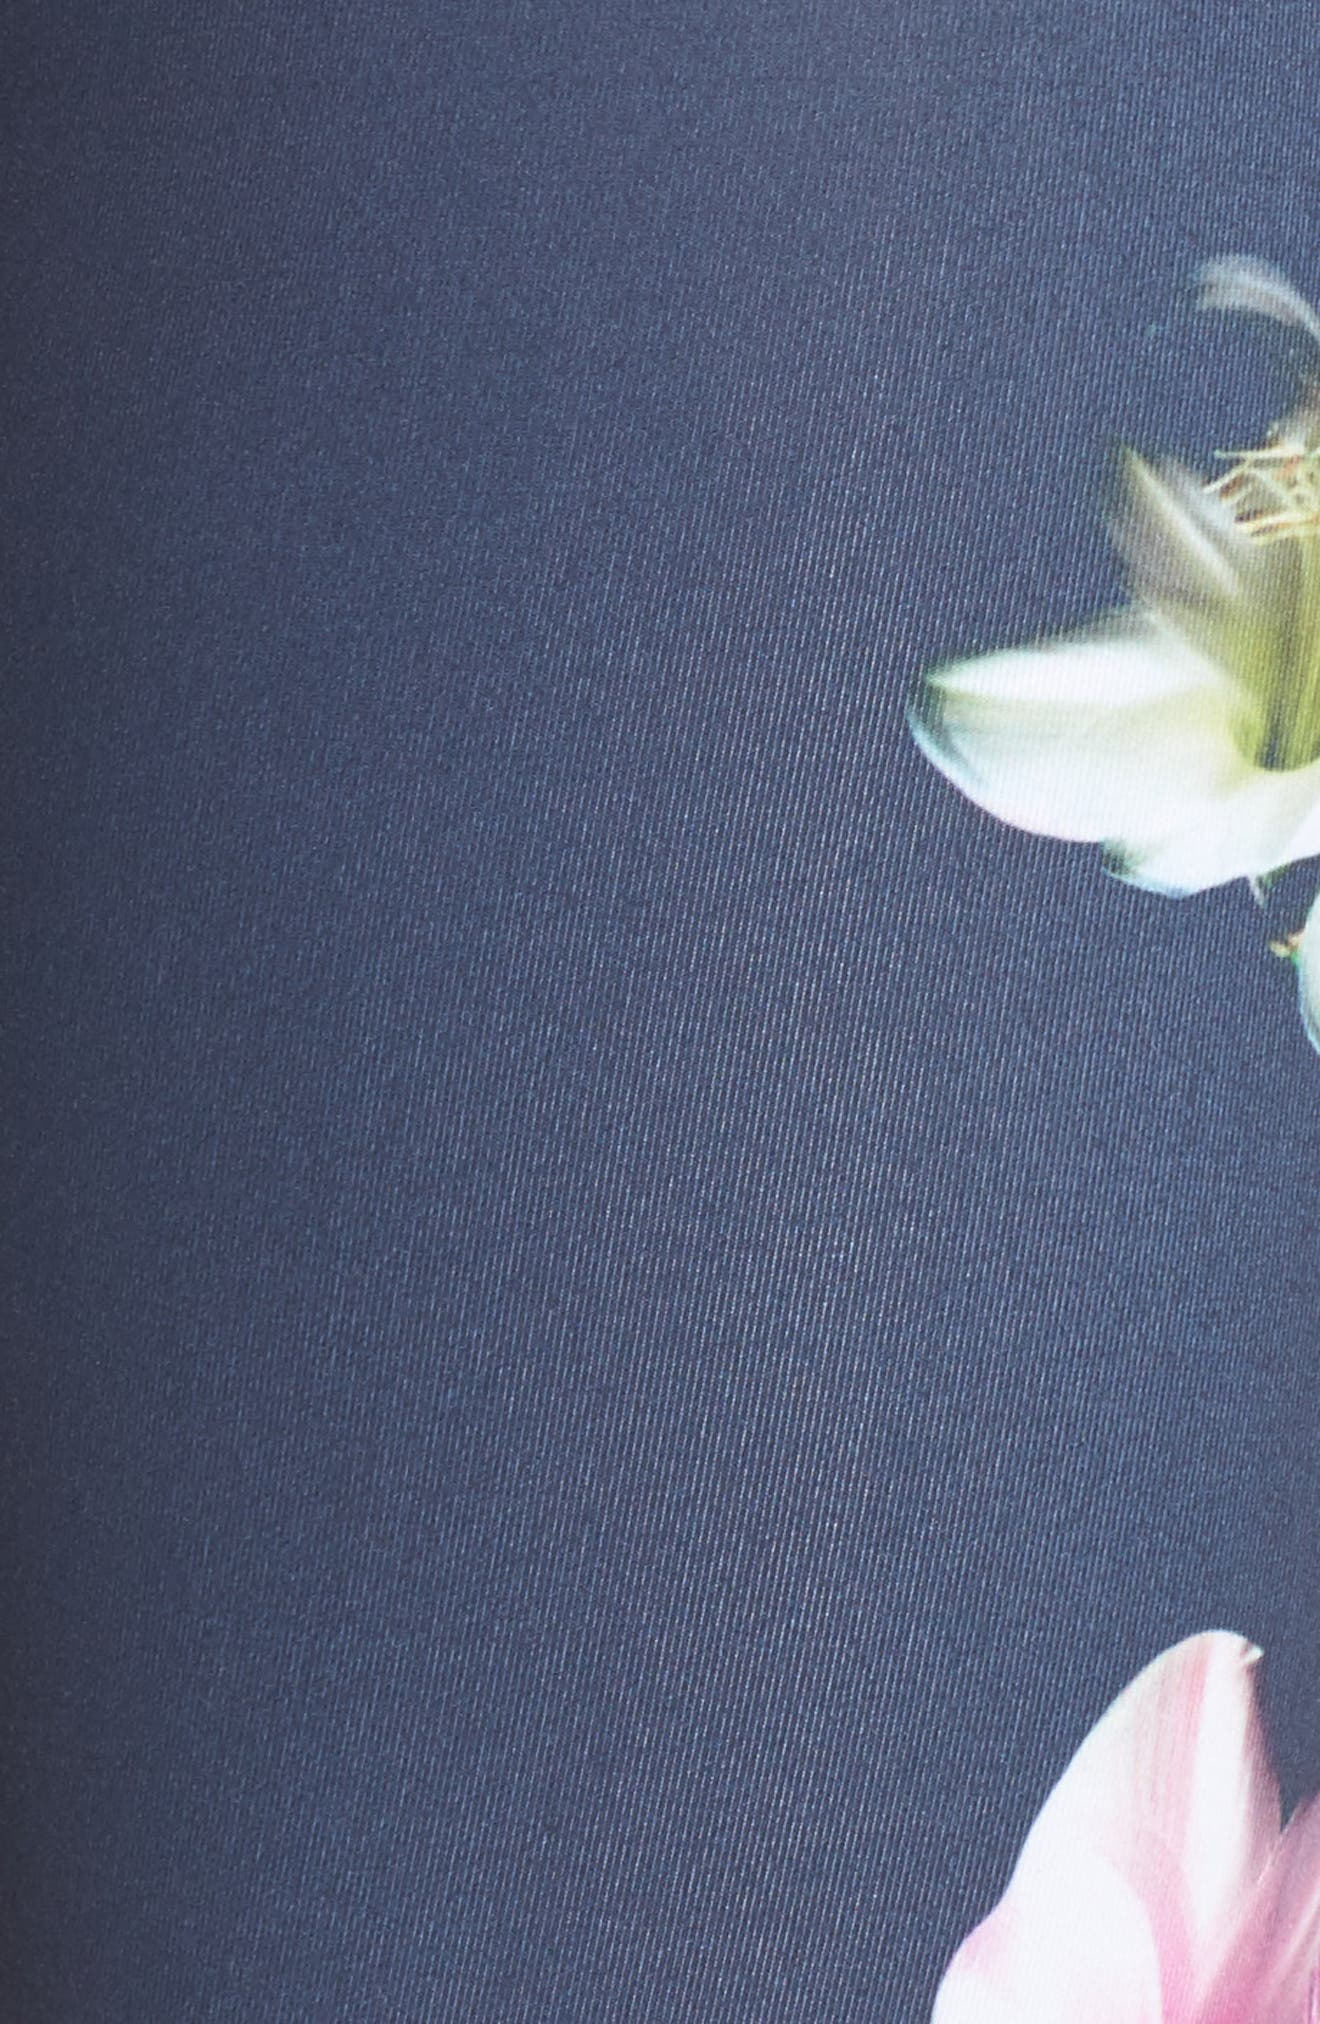 Pure Floral Ink High Waist Leggings,                             Alternate thumbnail 6, color,                             Grey Slate Floral Engineer Prt